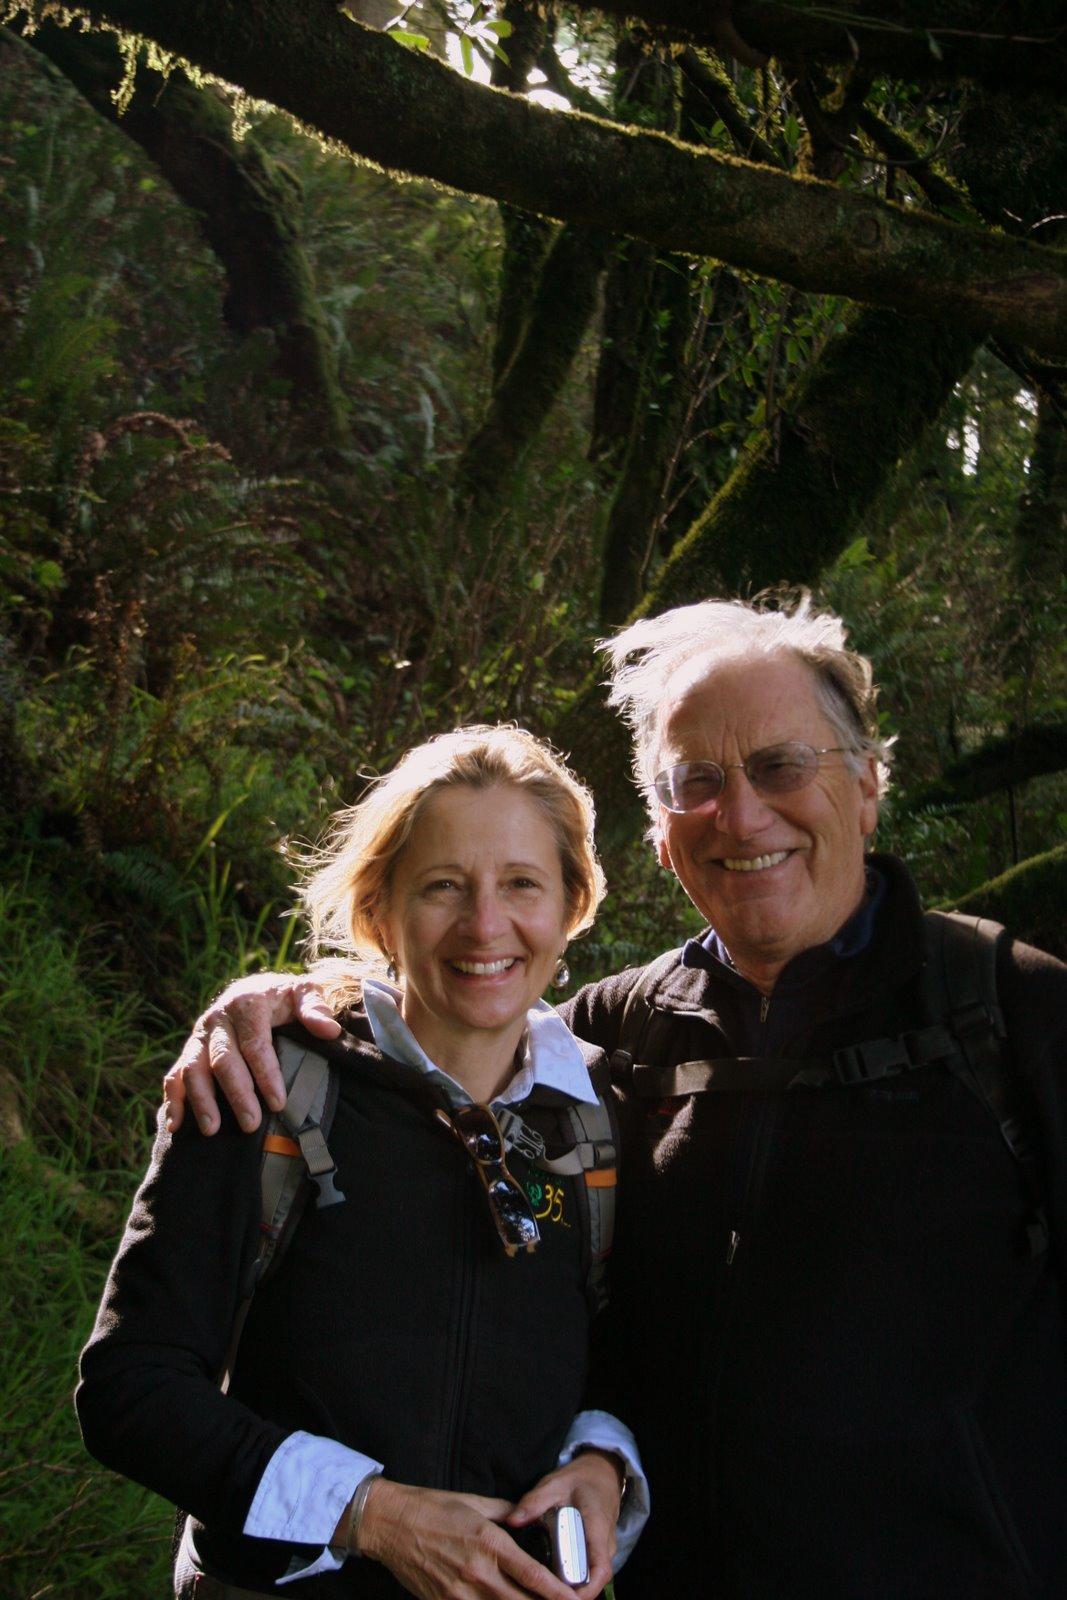 Nadia and Leo LeBon hiking in Northern California, January 25, 2009